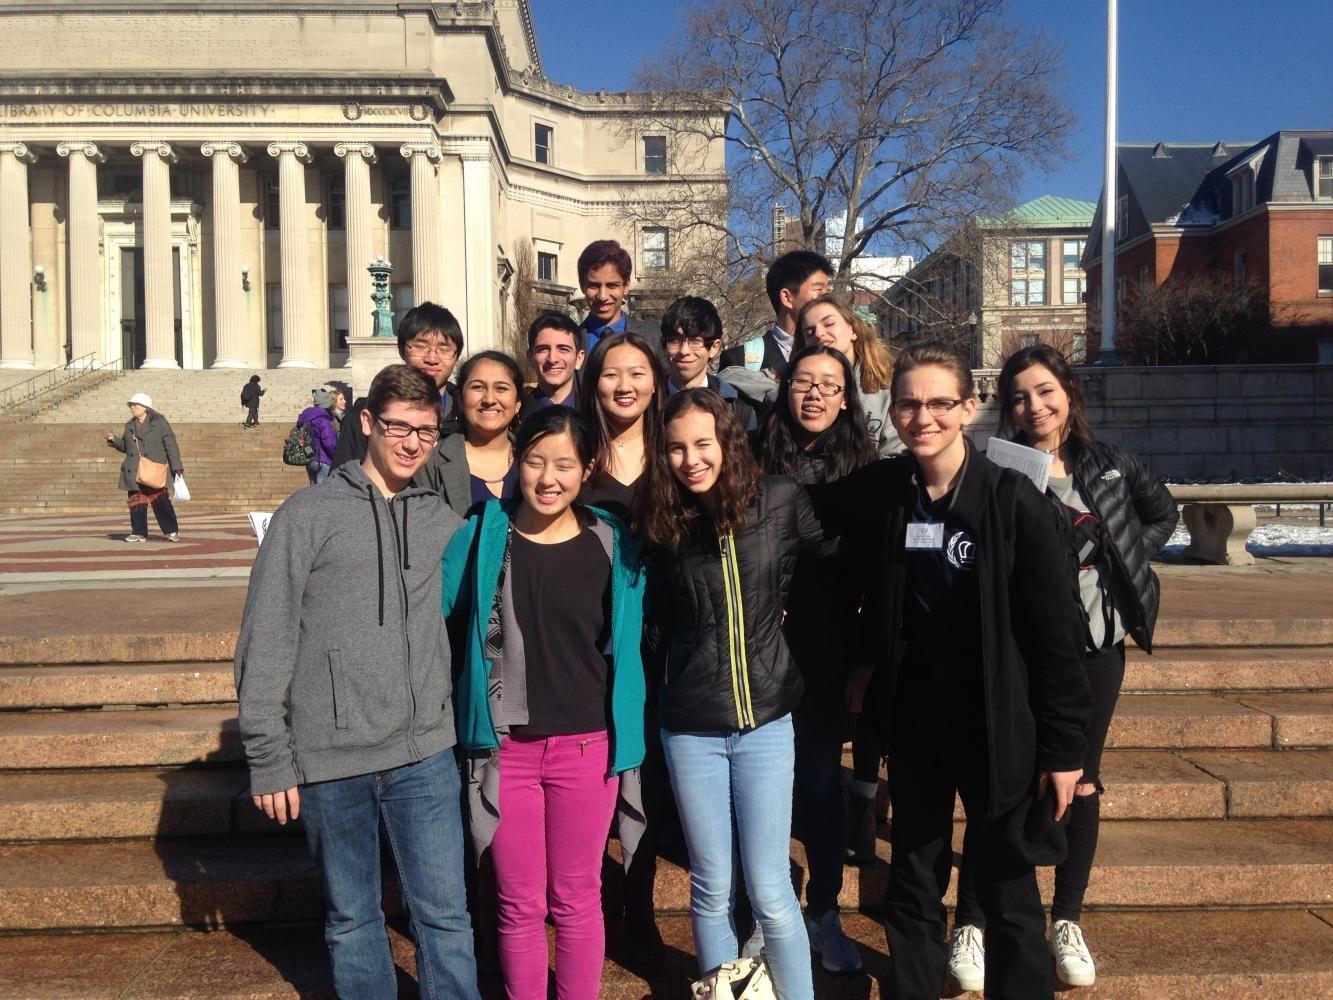 The Model UN club at Columbia University in January. Photo courtesy of Sara Bargiel